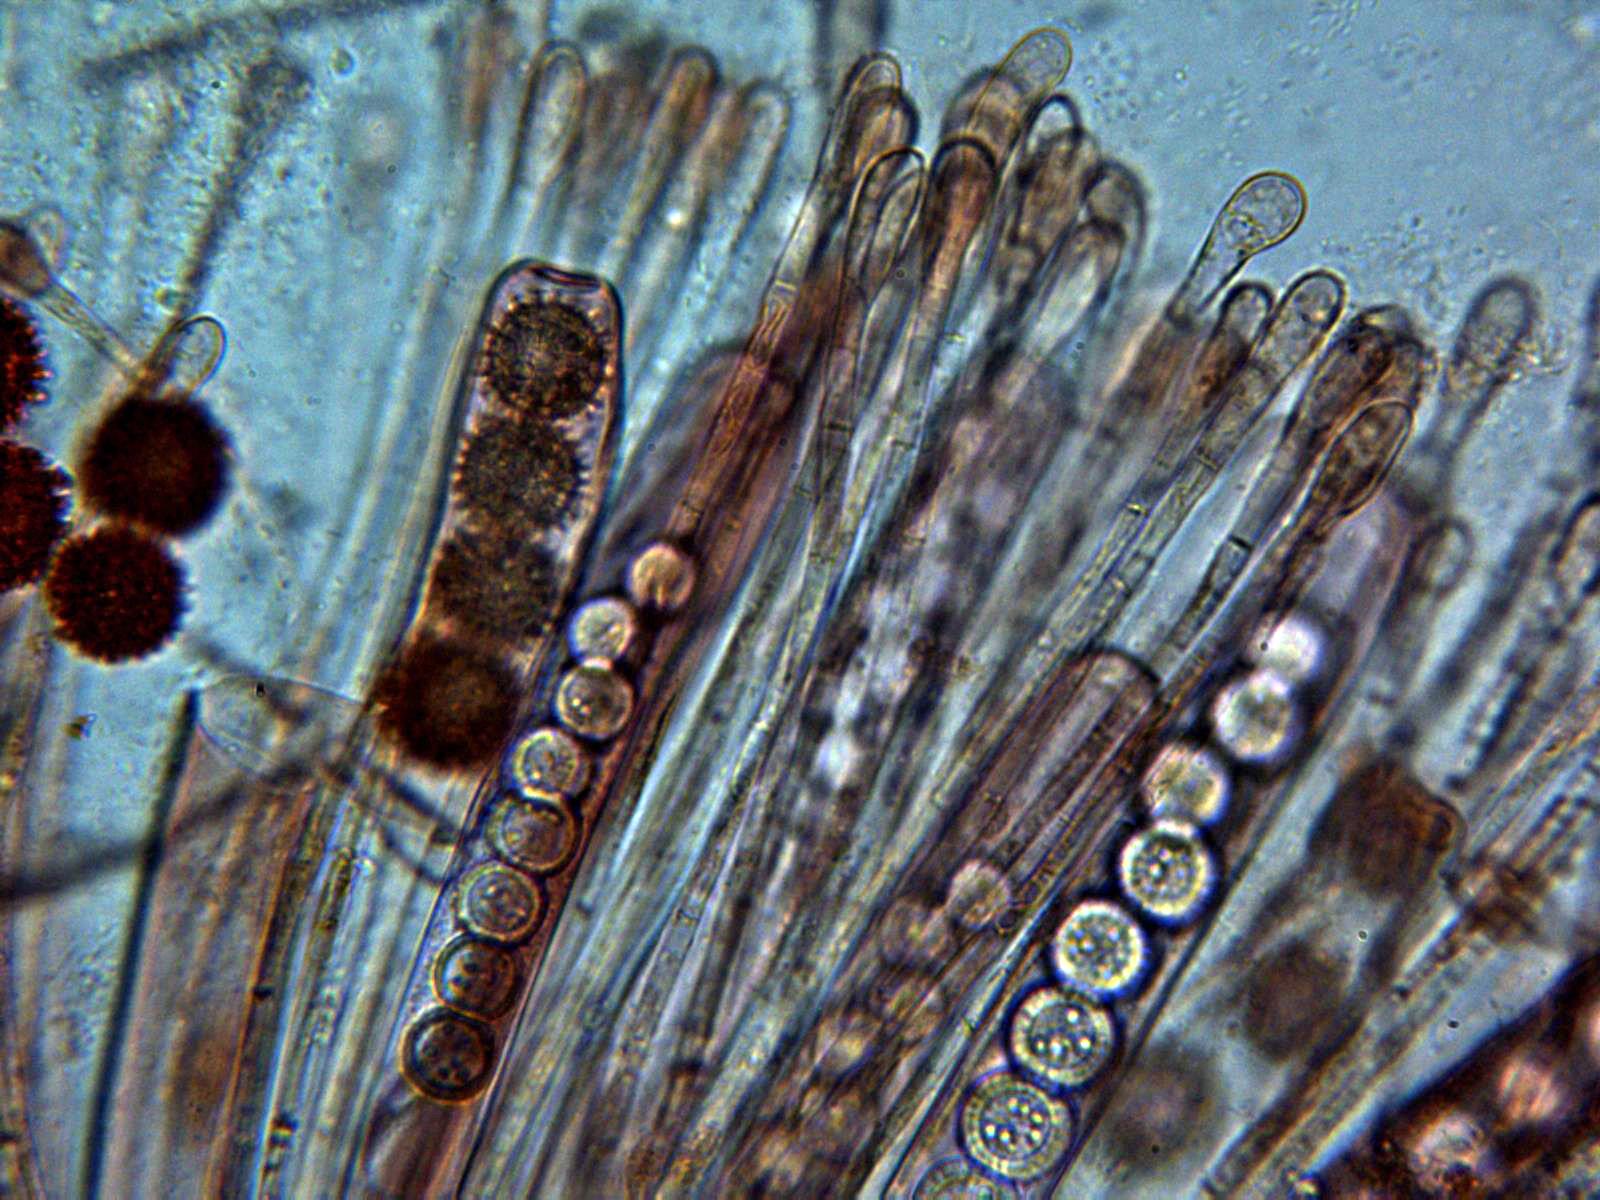 10-Ascosyparfisis.jpg